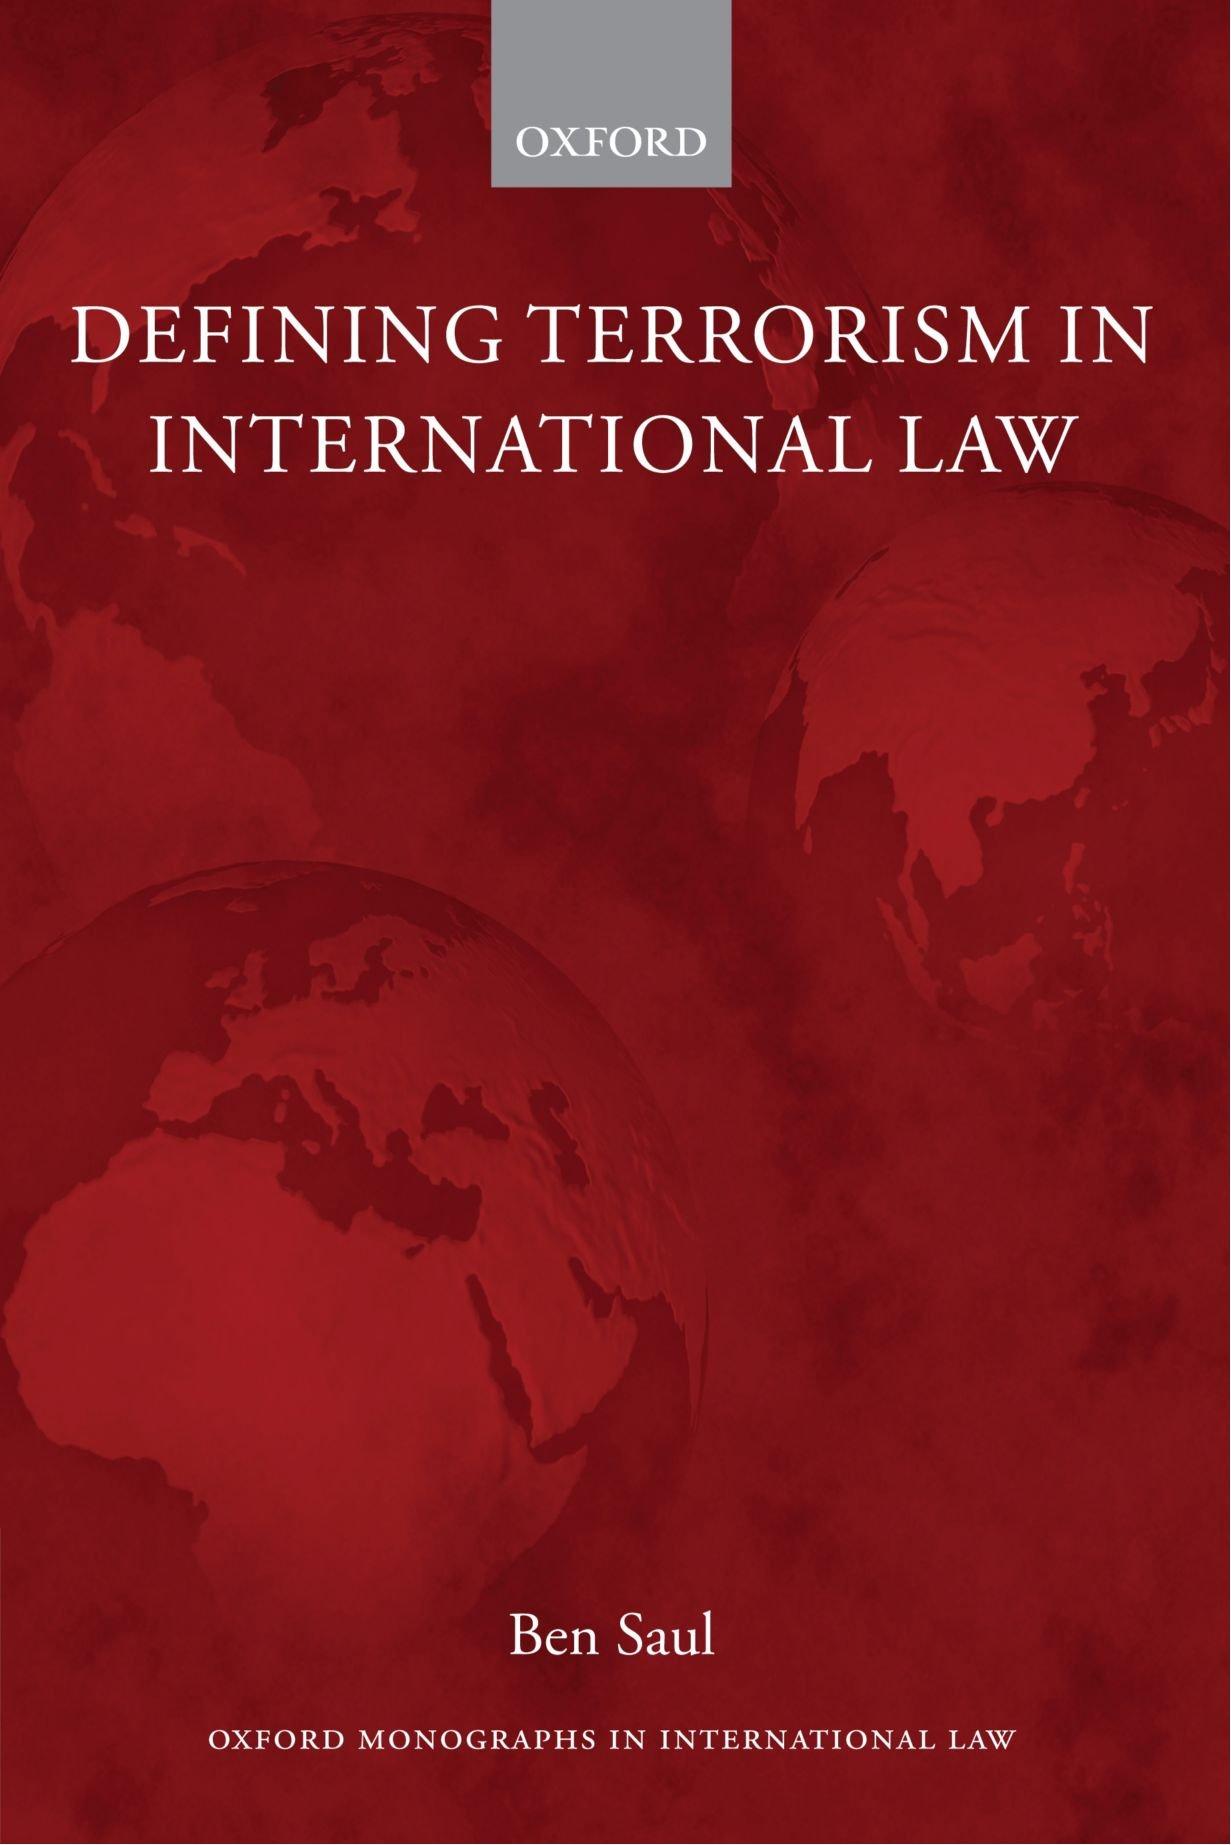 Defining Terrorism in International Law (Oxford Monographs in International Law) by Oxford University Press